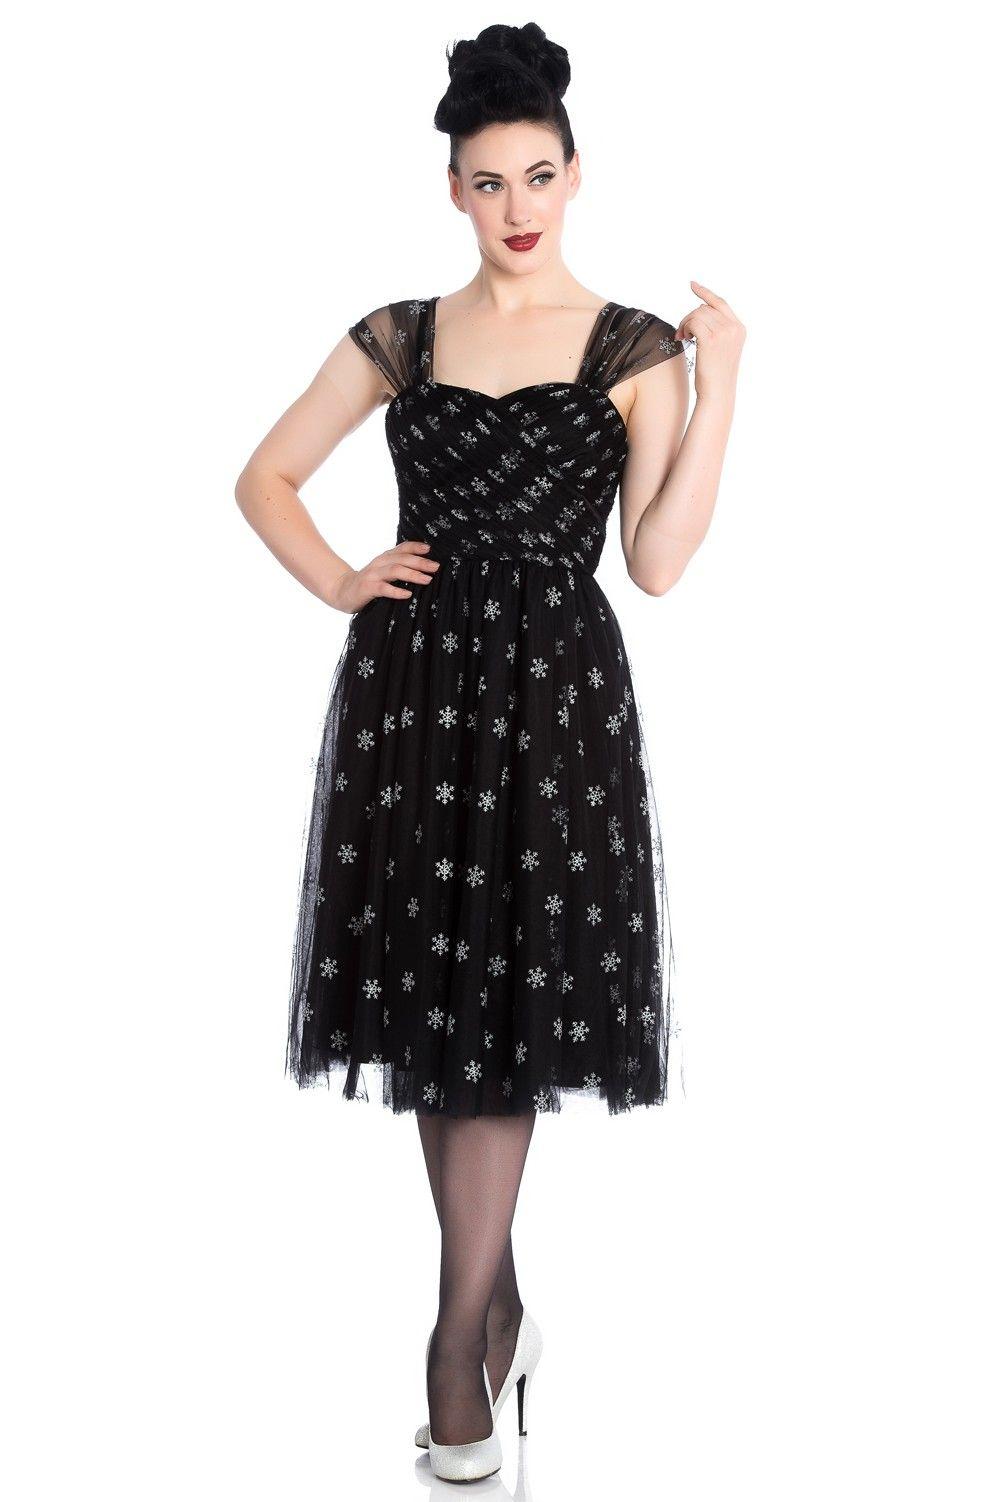 Snowstar dress hellbunny wishlist pinterest black tulle dress